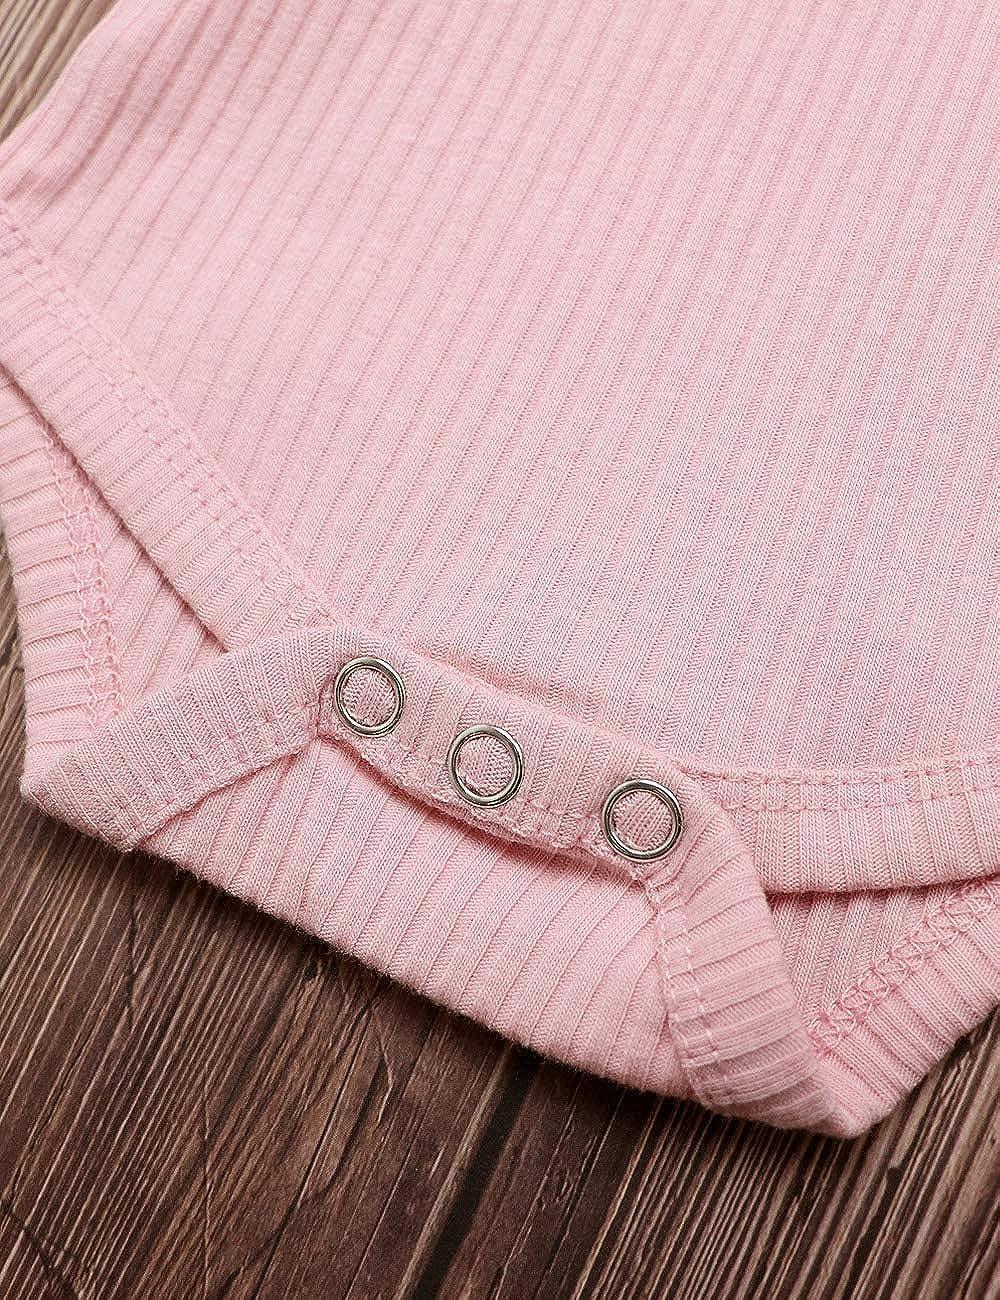 Leopard Pants KANGKANG Toddler Baby Girl Long Sleeve Ruffle Dress Tops Headband Outfit 3Pcs Sets